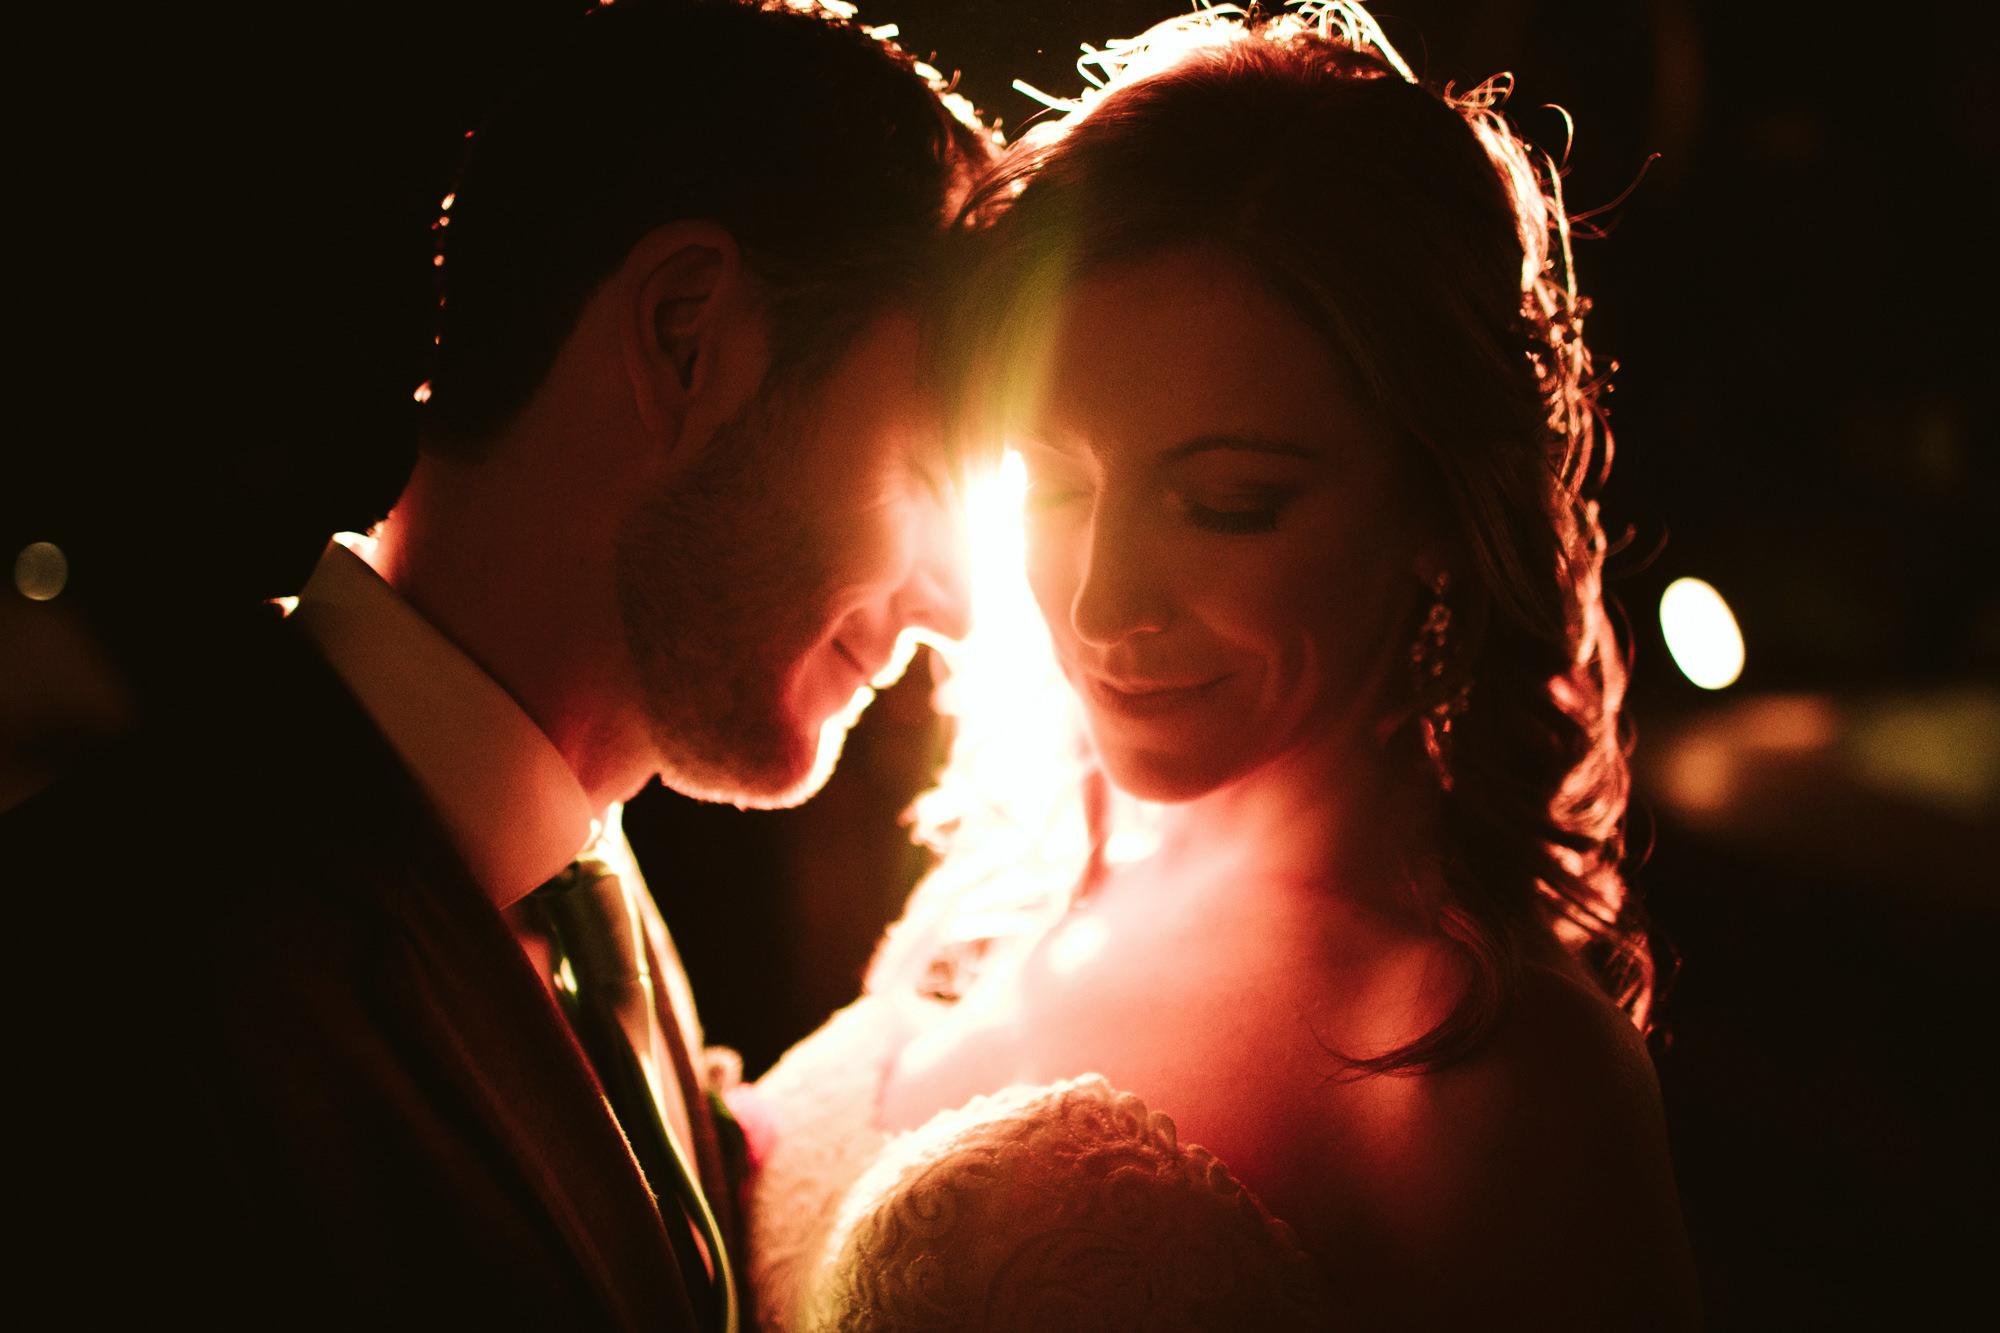 Destination-wedding-photographer-267.jpg